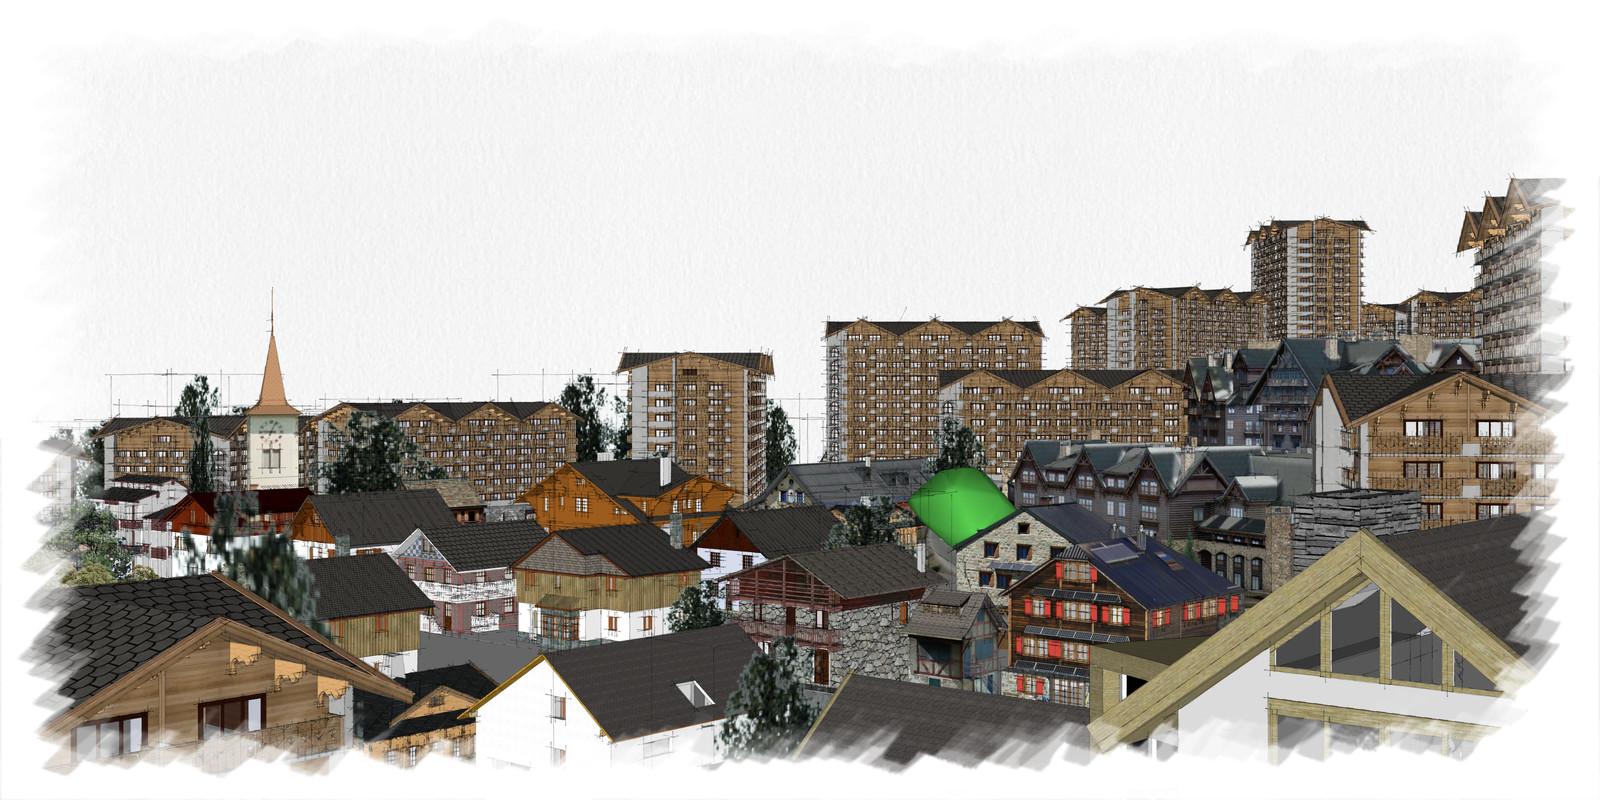 SketchUp 2018  Alpine Village Full-Scene 5 2x1 02 SU C